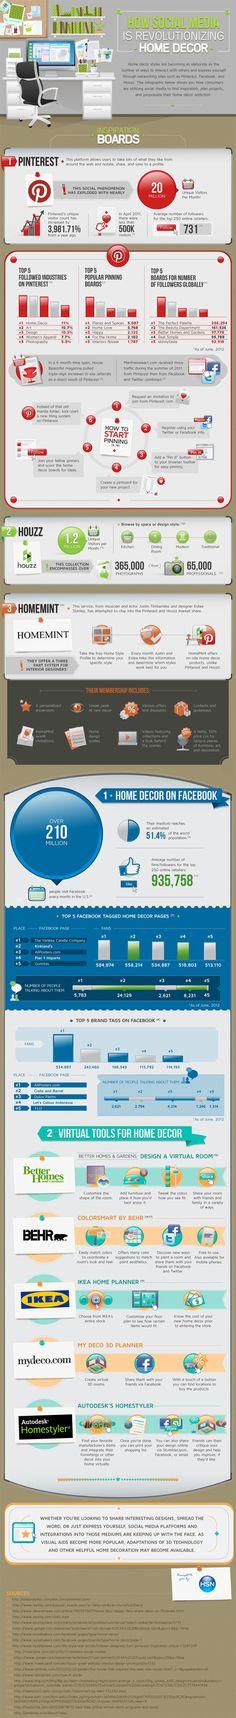 Social Media Home Decor - Infographic